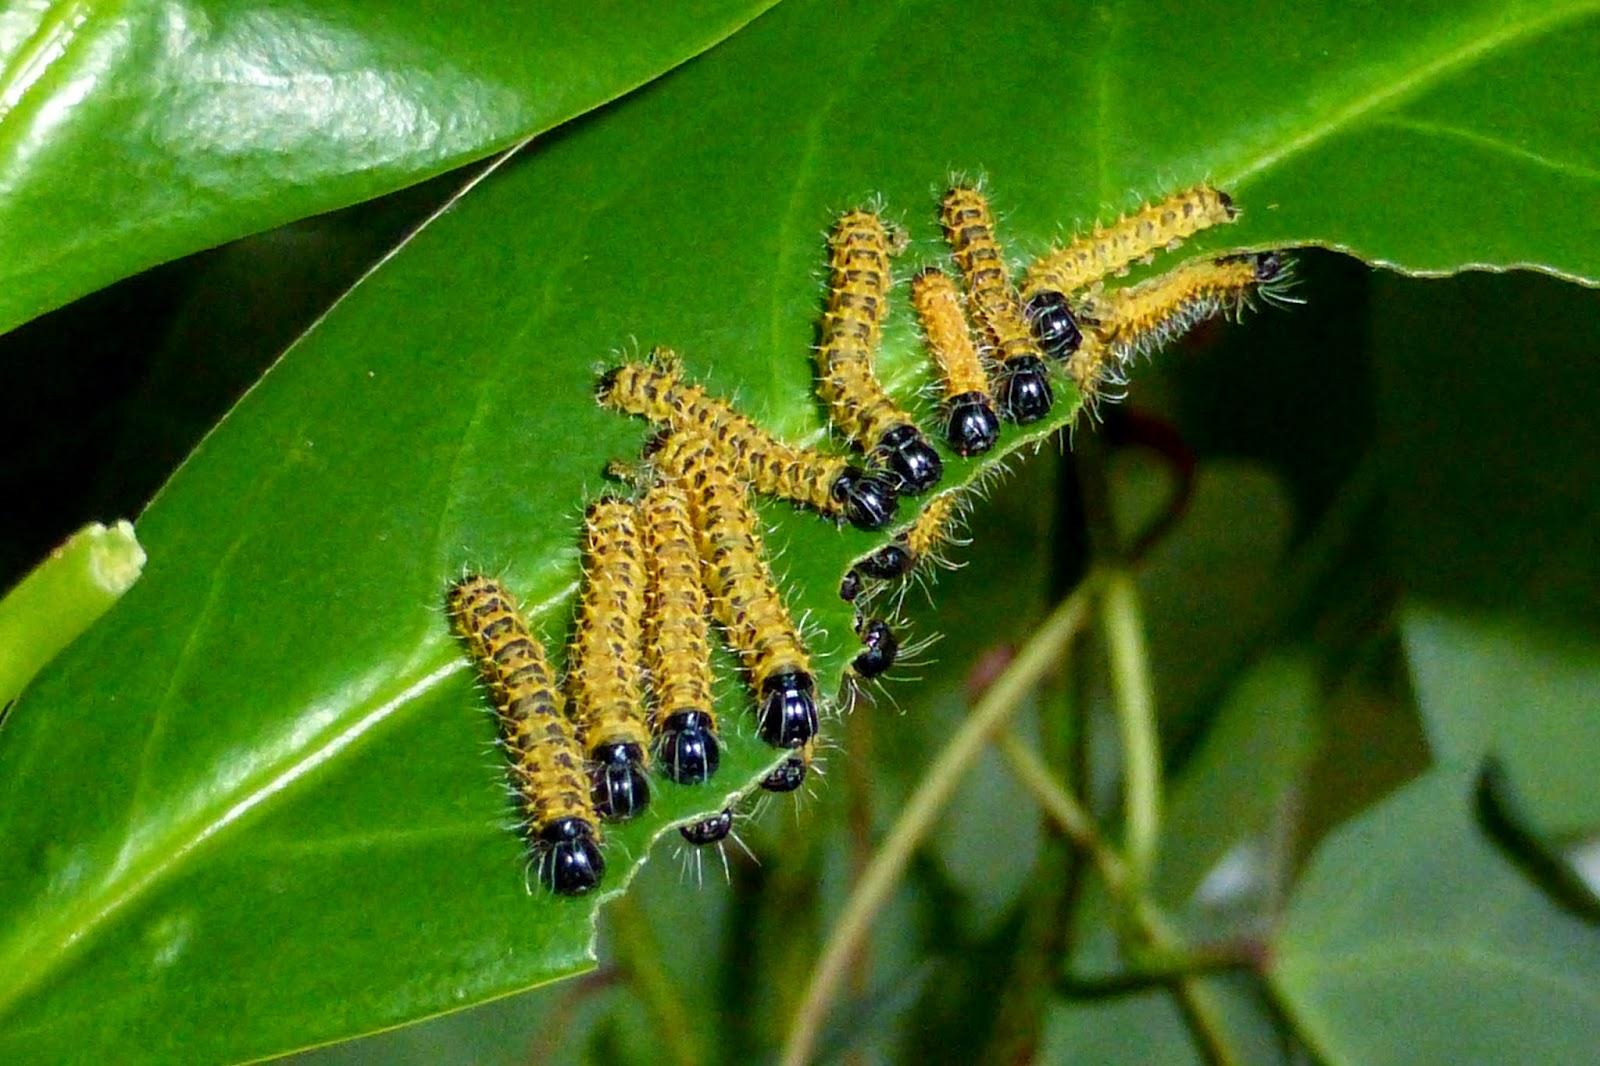 Nudaurelia wahlbergii caterpillar